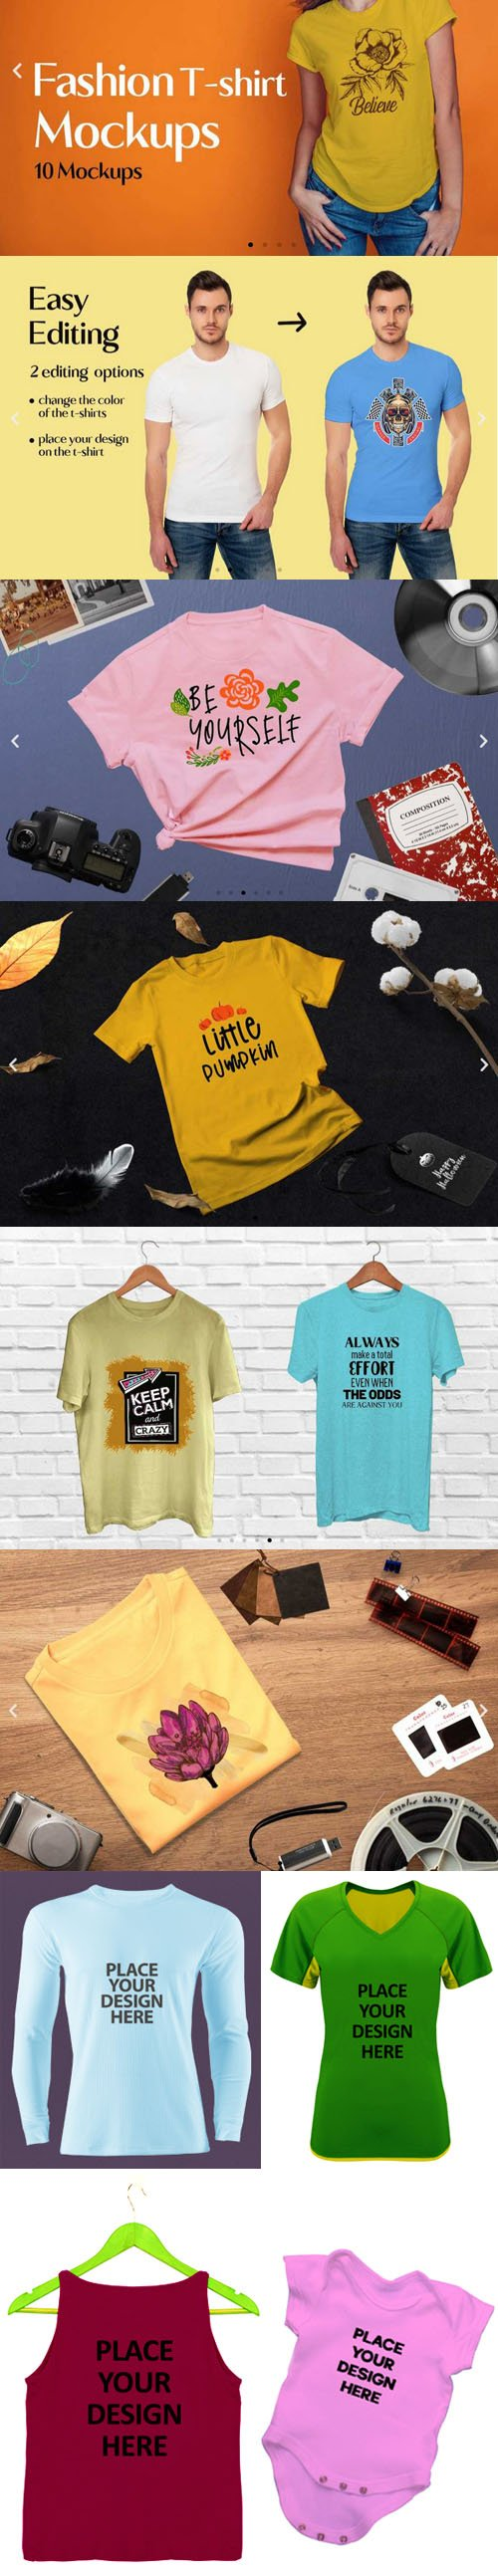 Fashion T-shirt PSD Mockups Collection